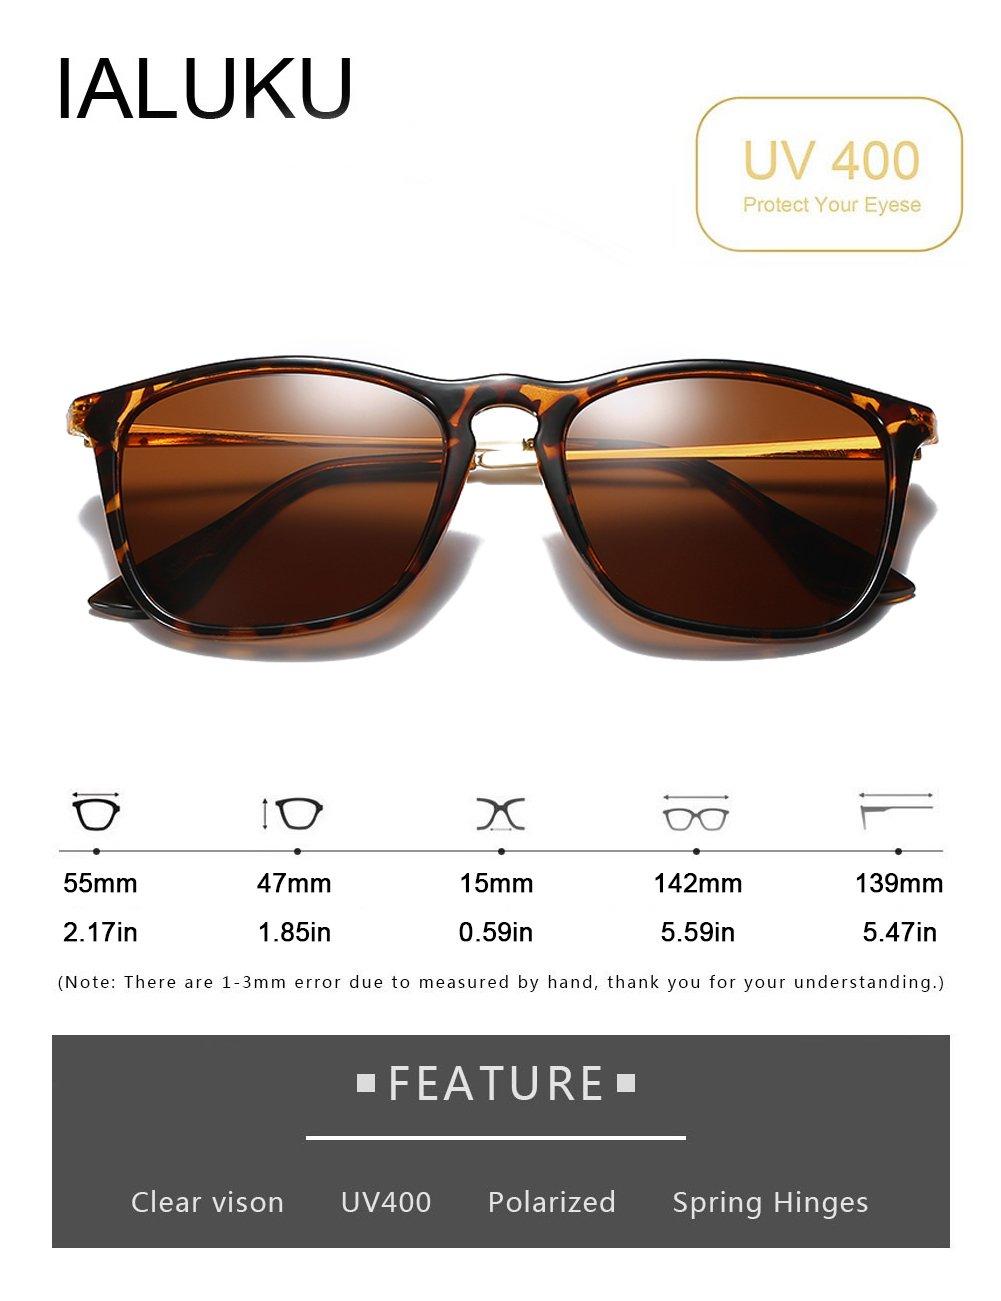 IALUKU Wayfarer Sunglasses Polarized Square Frame UV400 Protection Retro Style for Women Men (Tortoise, 55)